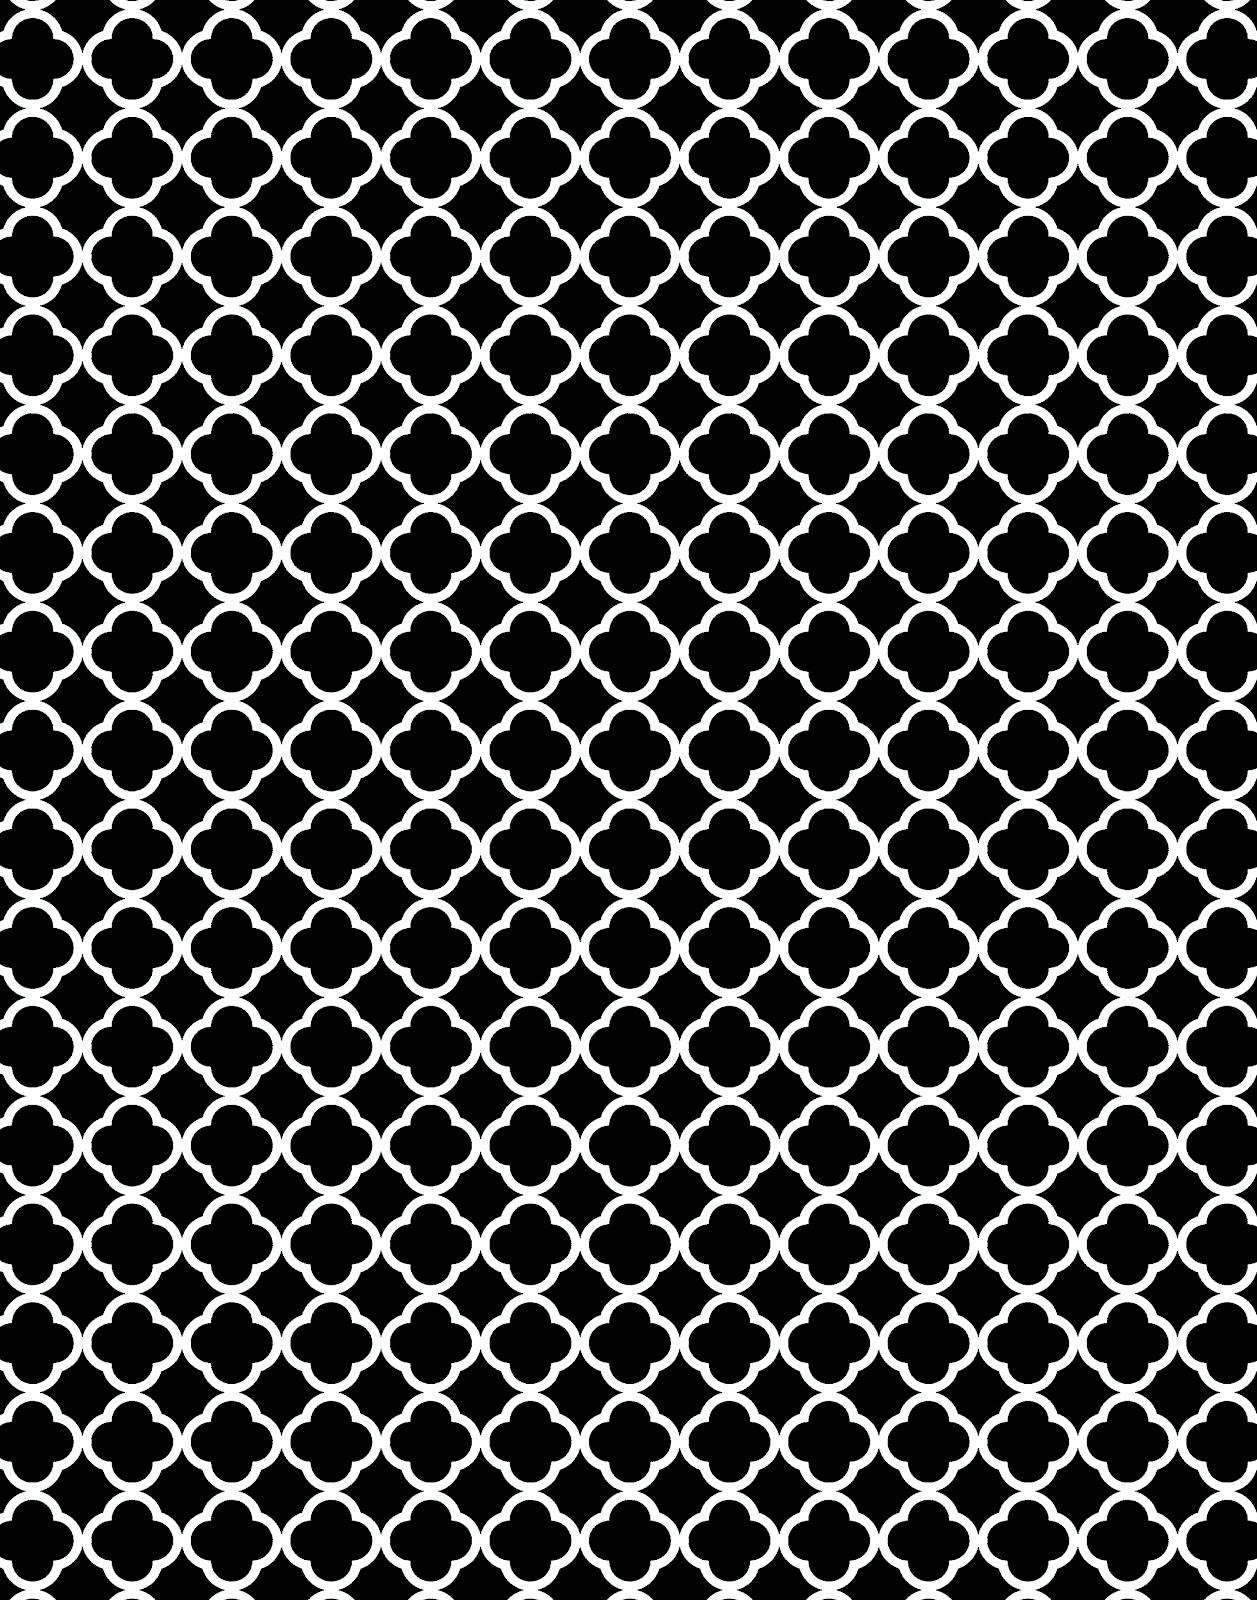 quatrefoil pattern background - photo #23